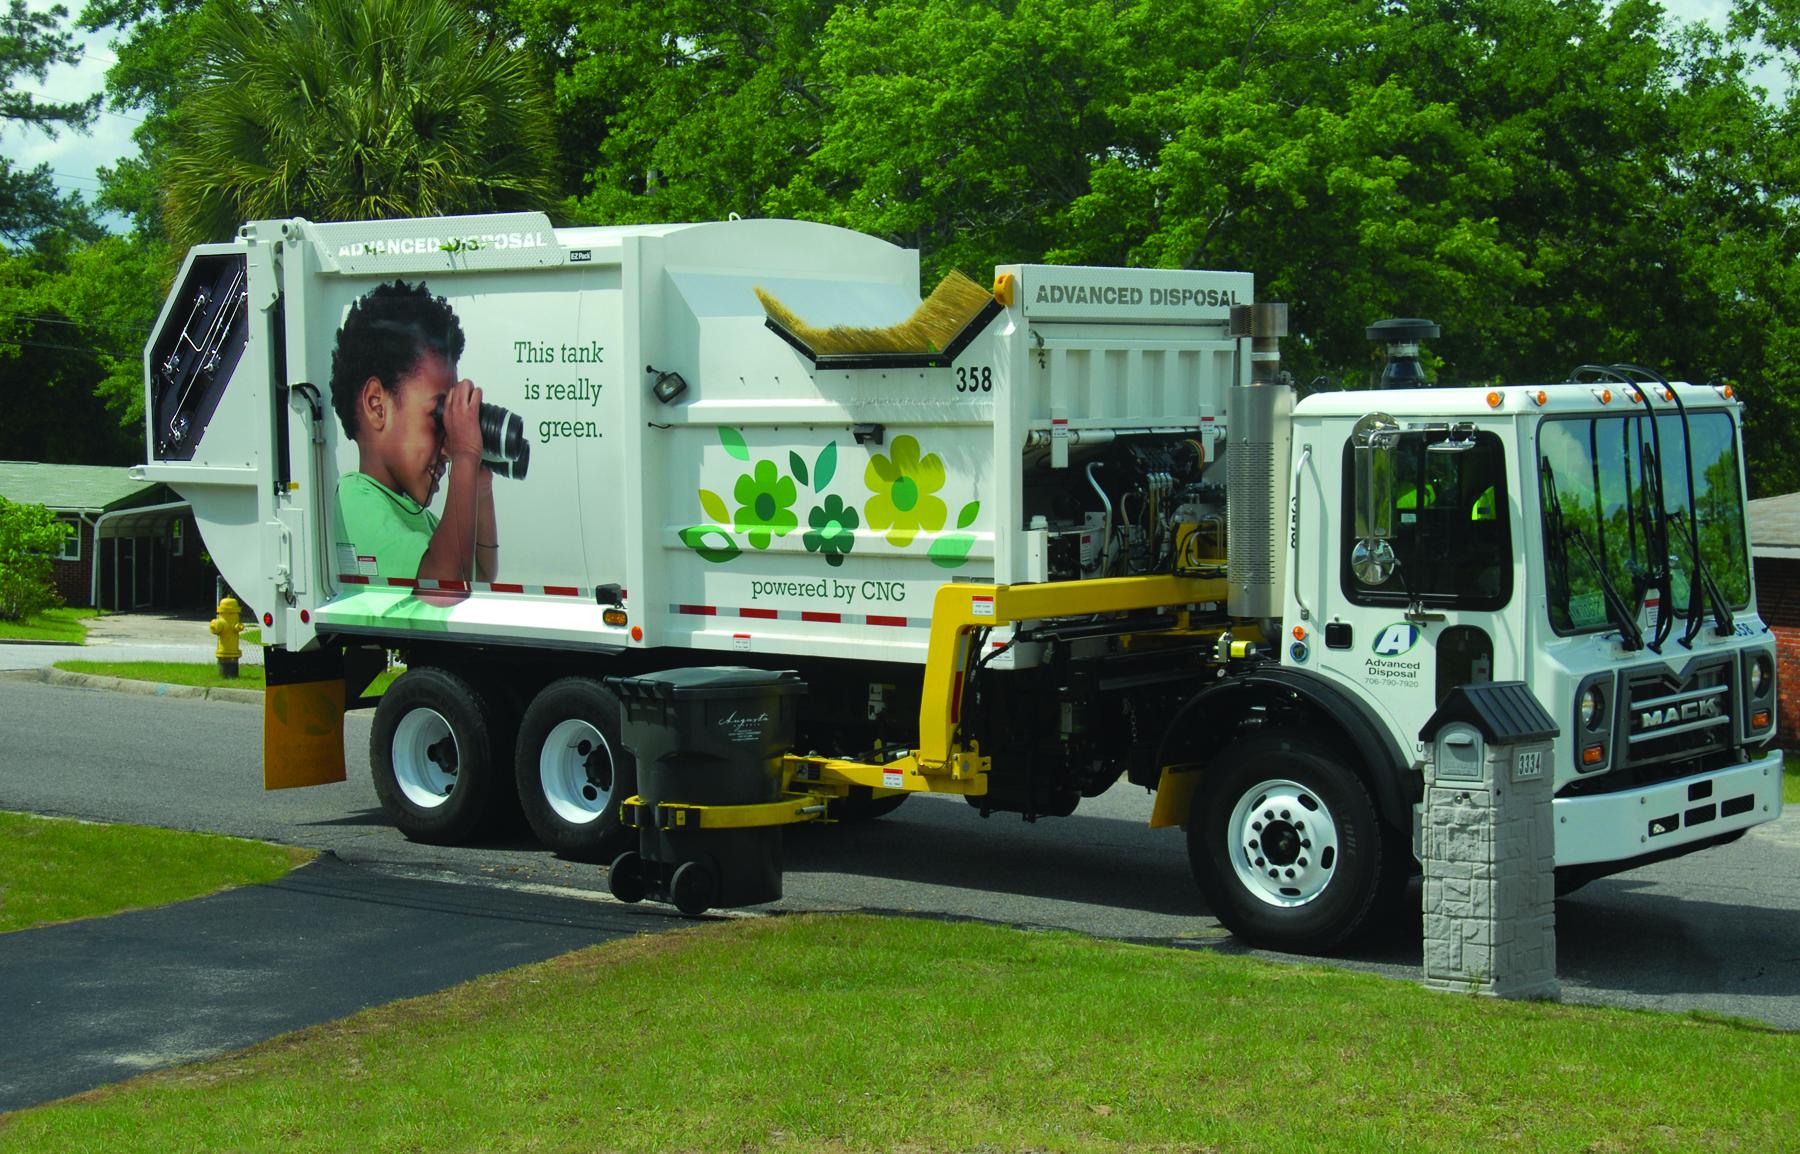 2014 Truck & Body Report | Waste360